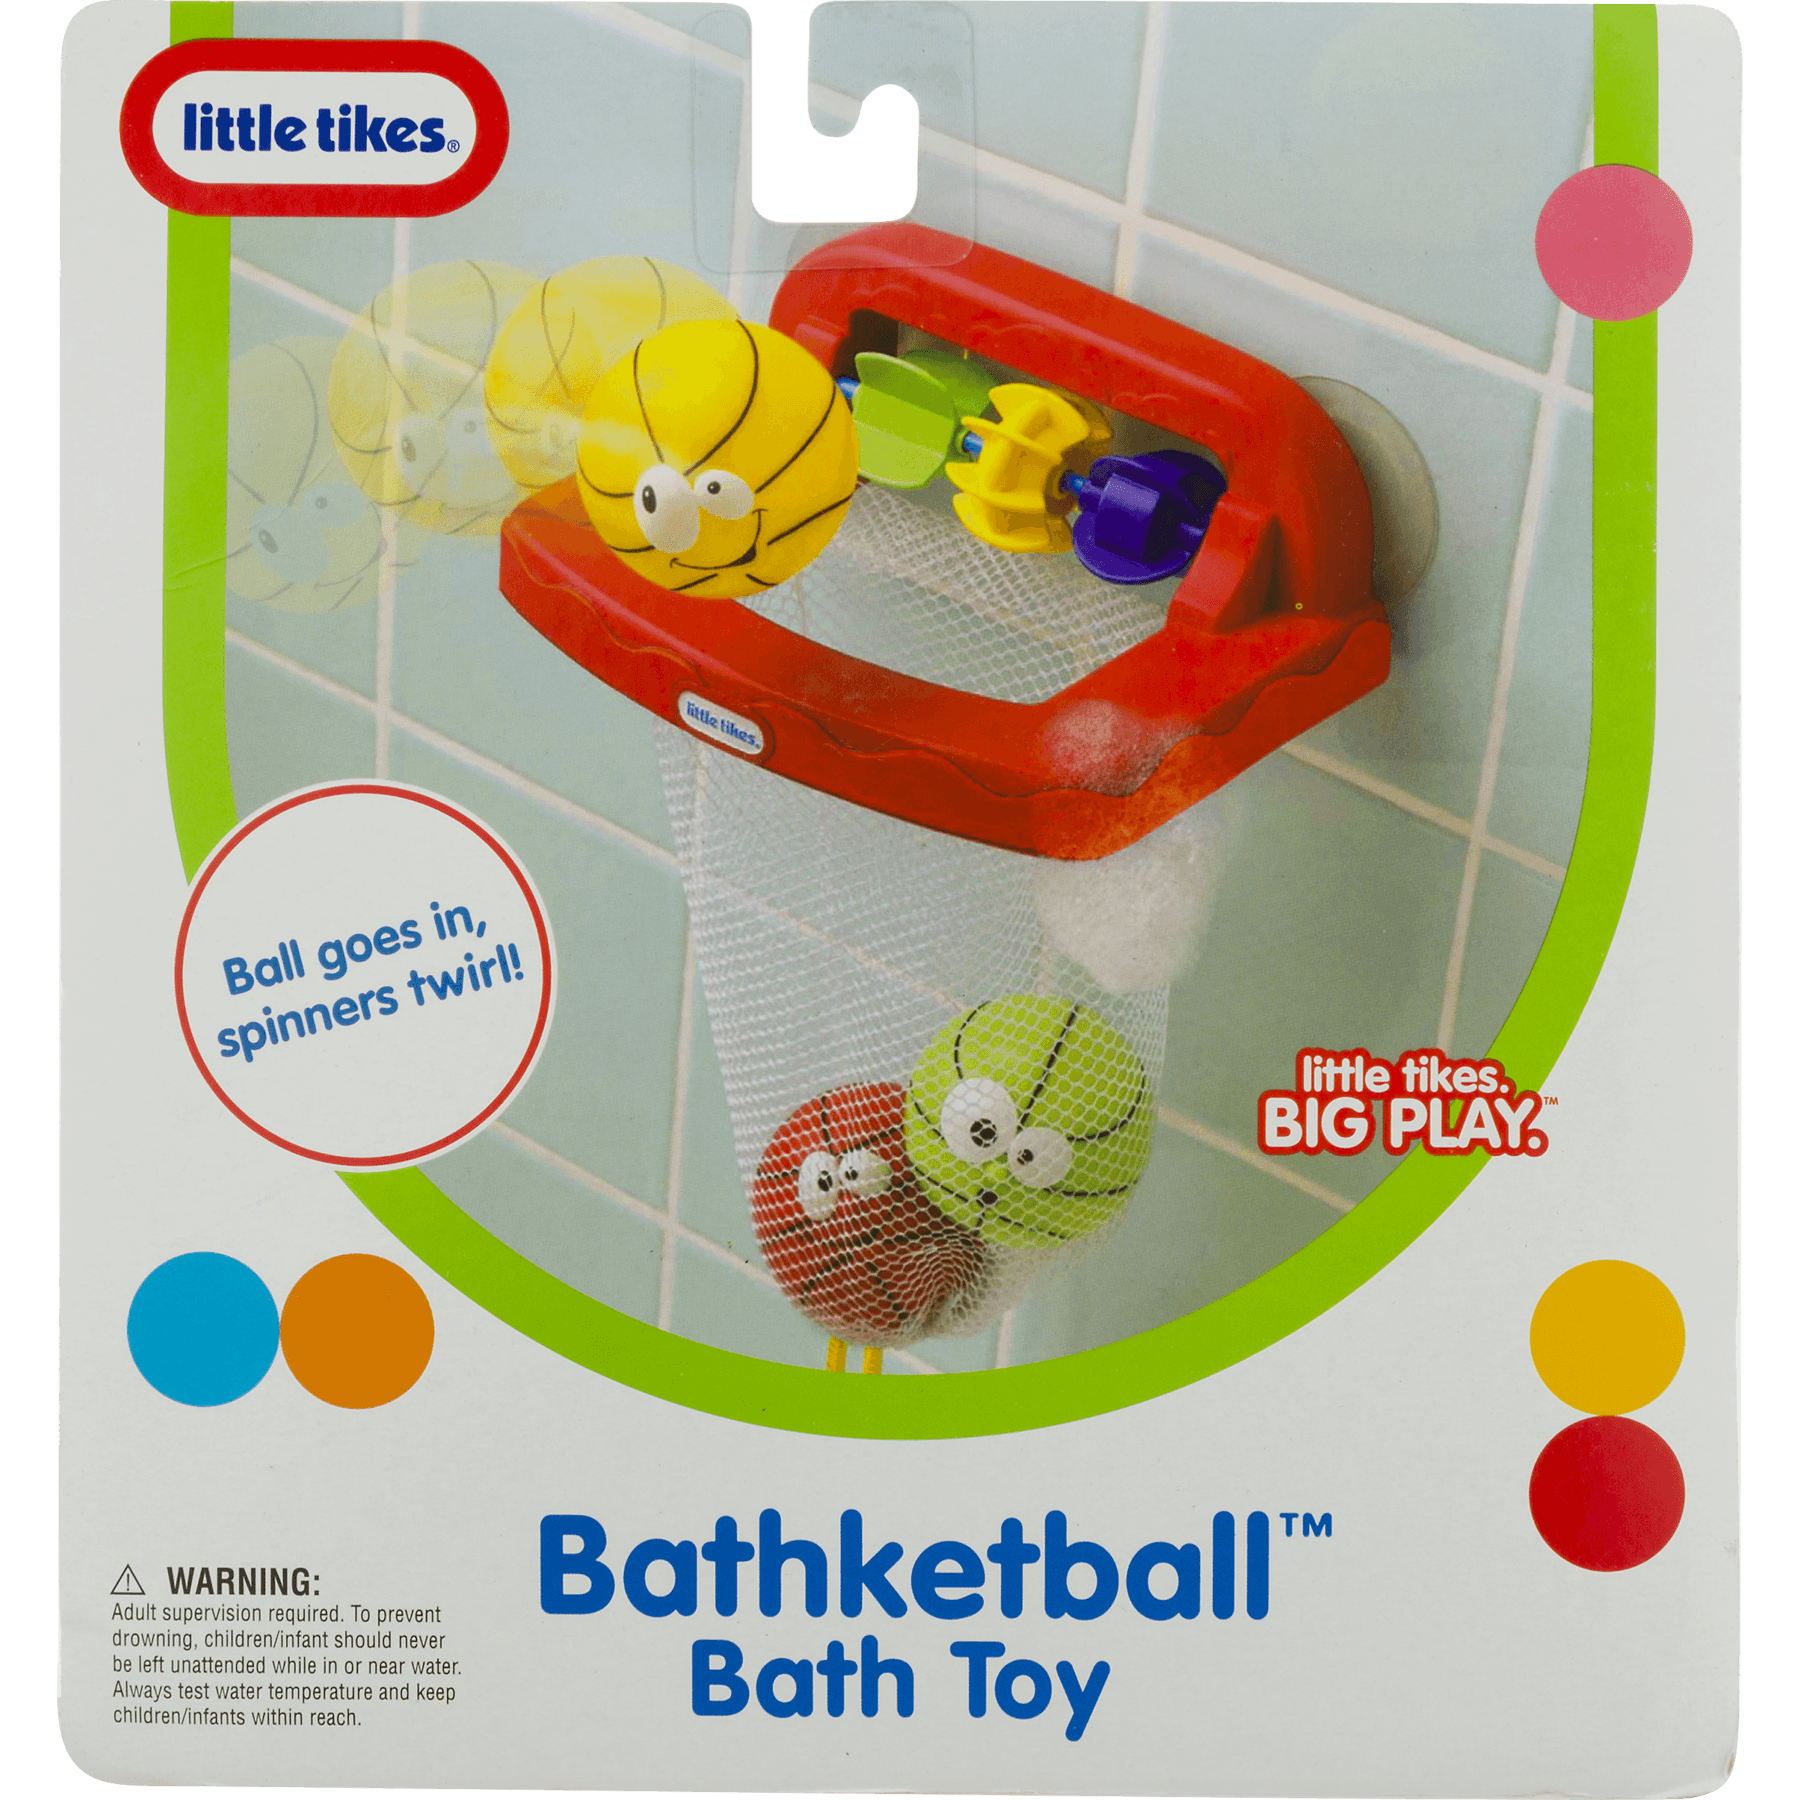 Little Tikes Bathketball BathToy 0+m, 1.0 CT - Walmart.com